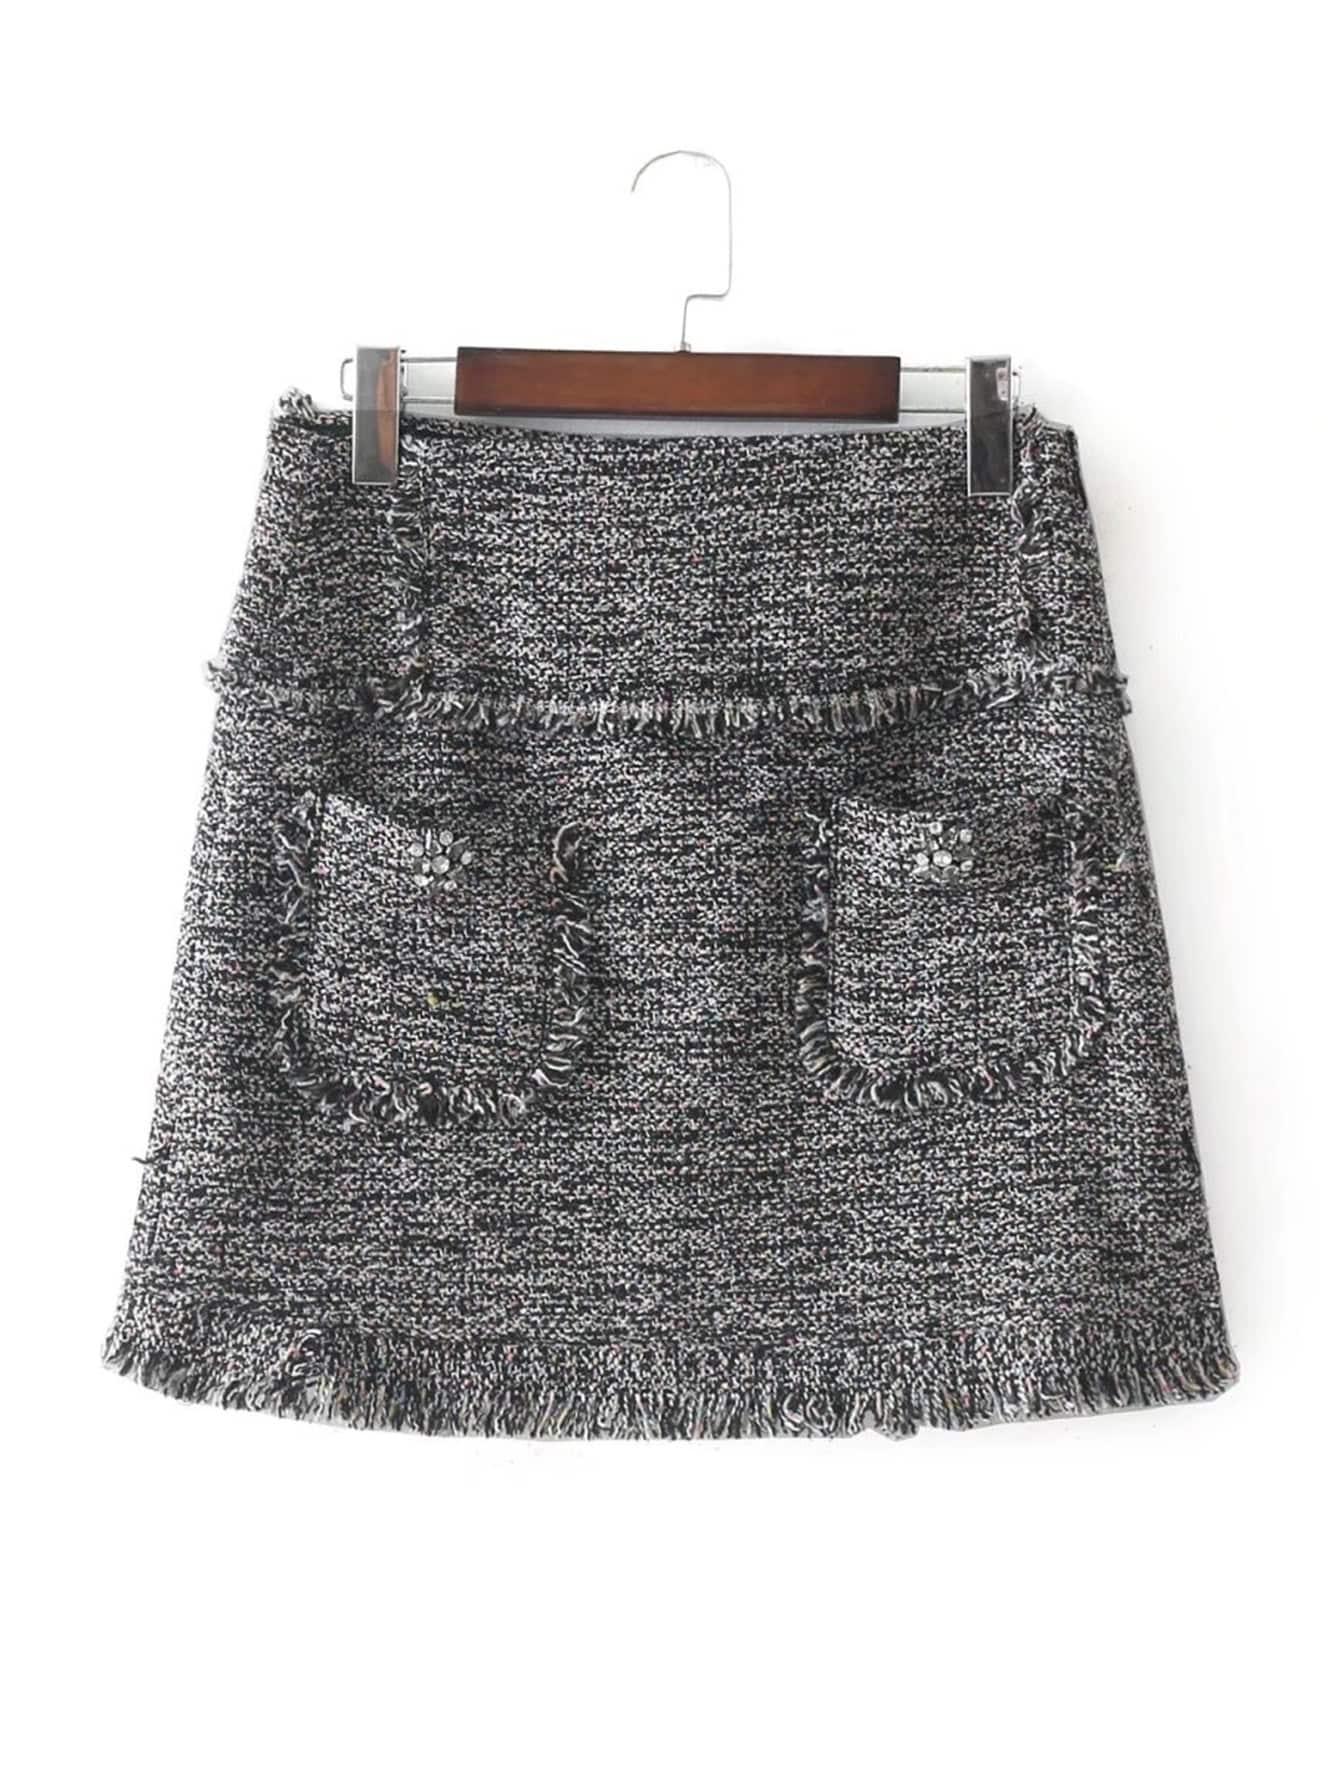 Rhinestone Detail Frayed Edge Tweed Skirt rhinestone detail frayed edge tweed skirt